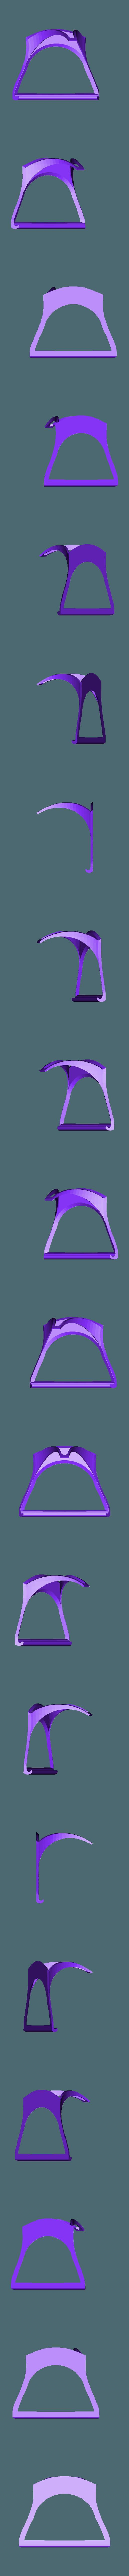 TabletStand.stl Download free STL file Slim Tablet Stand • Object to 3D print, MatsErik